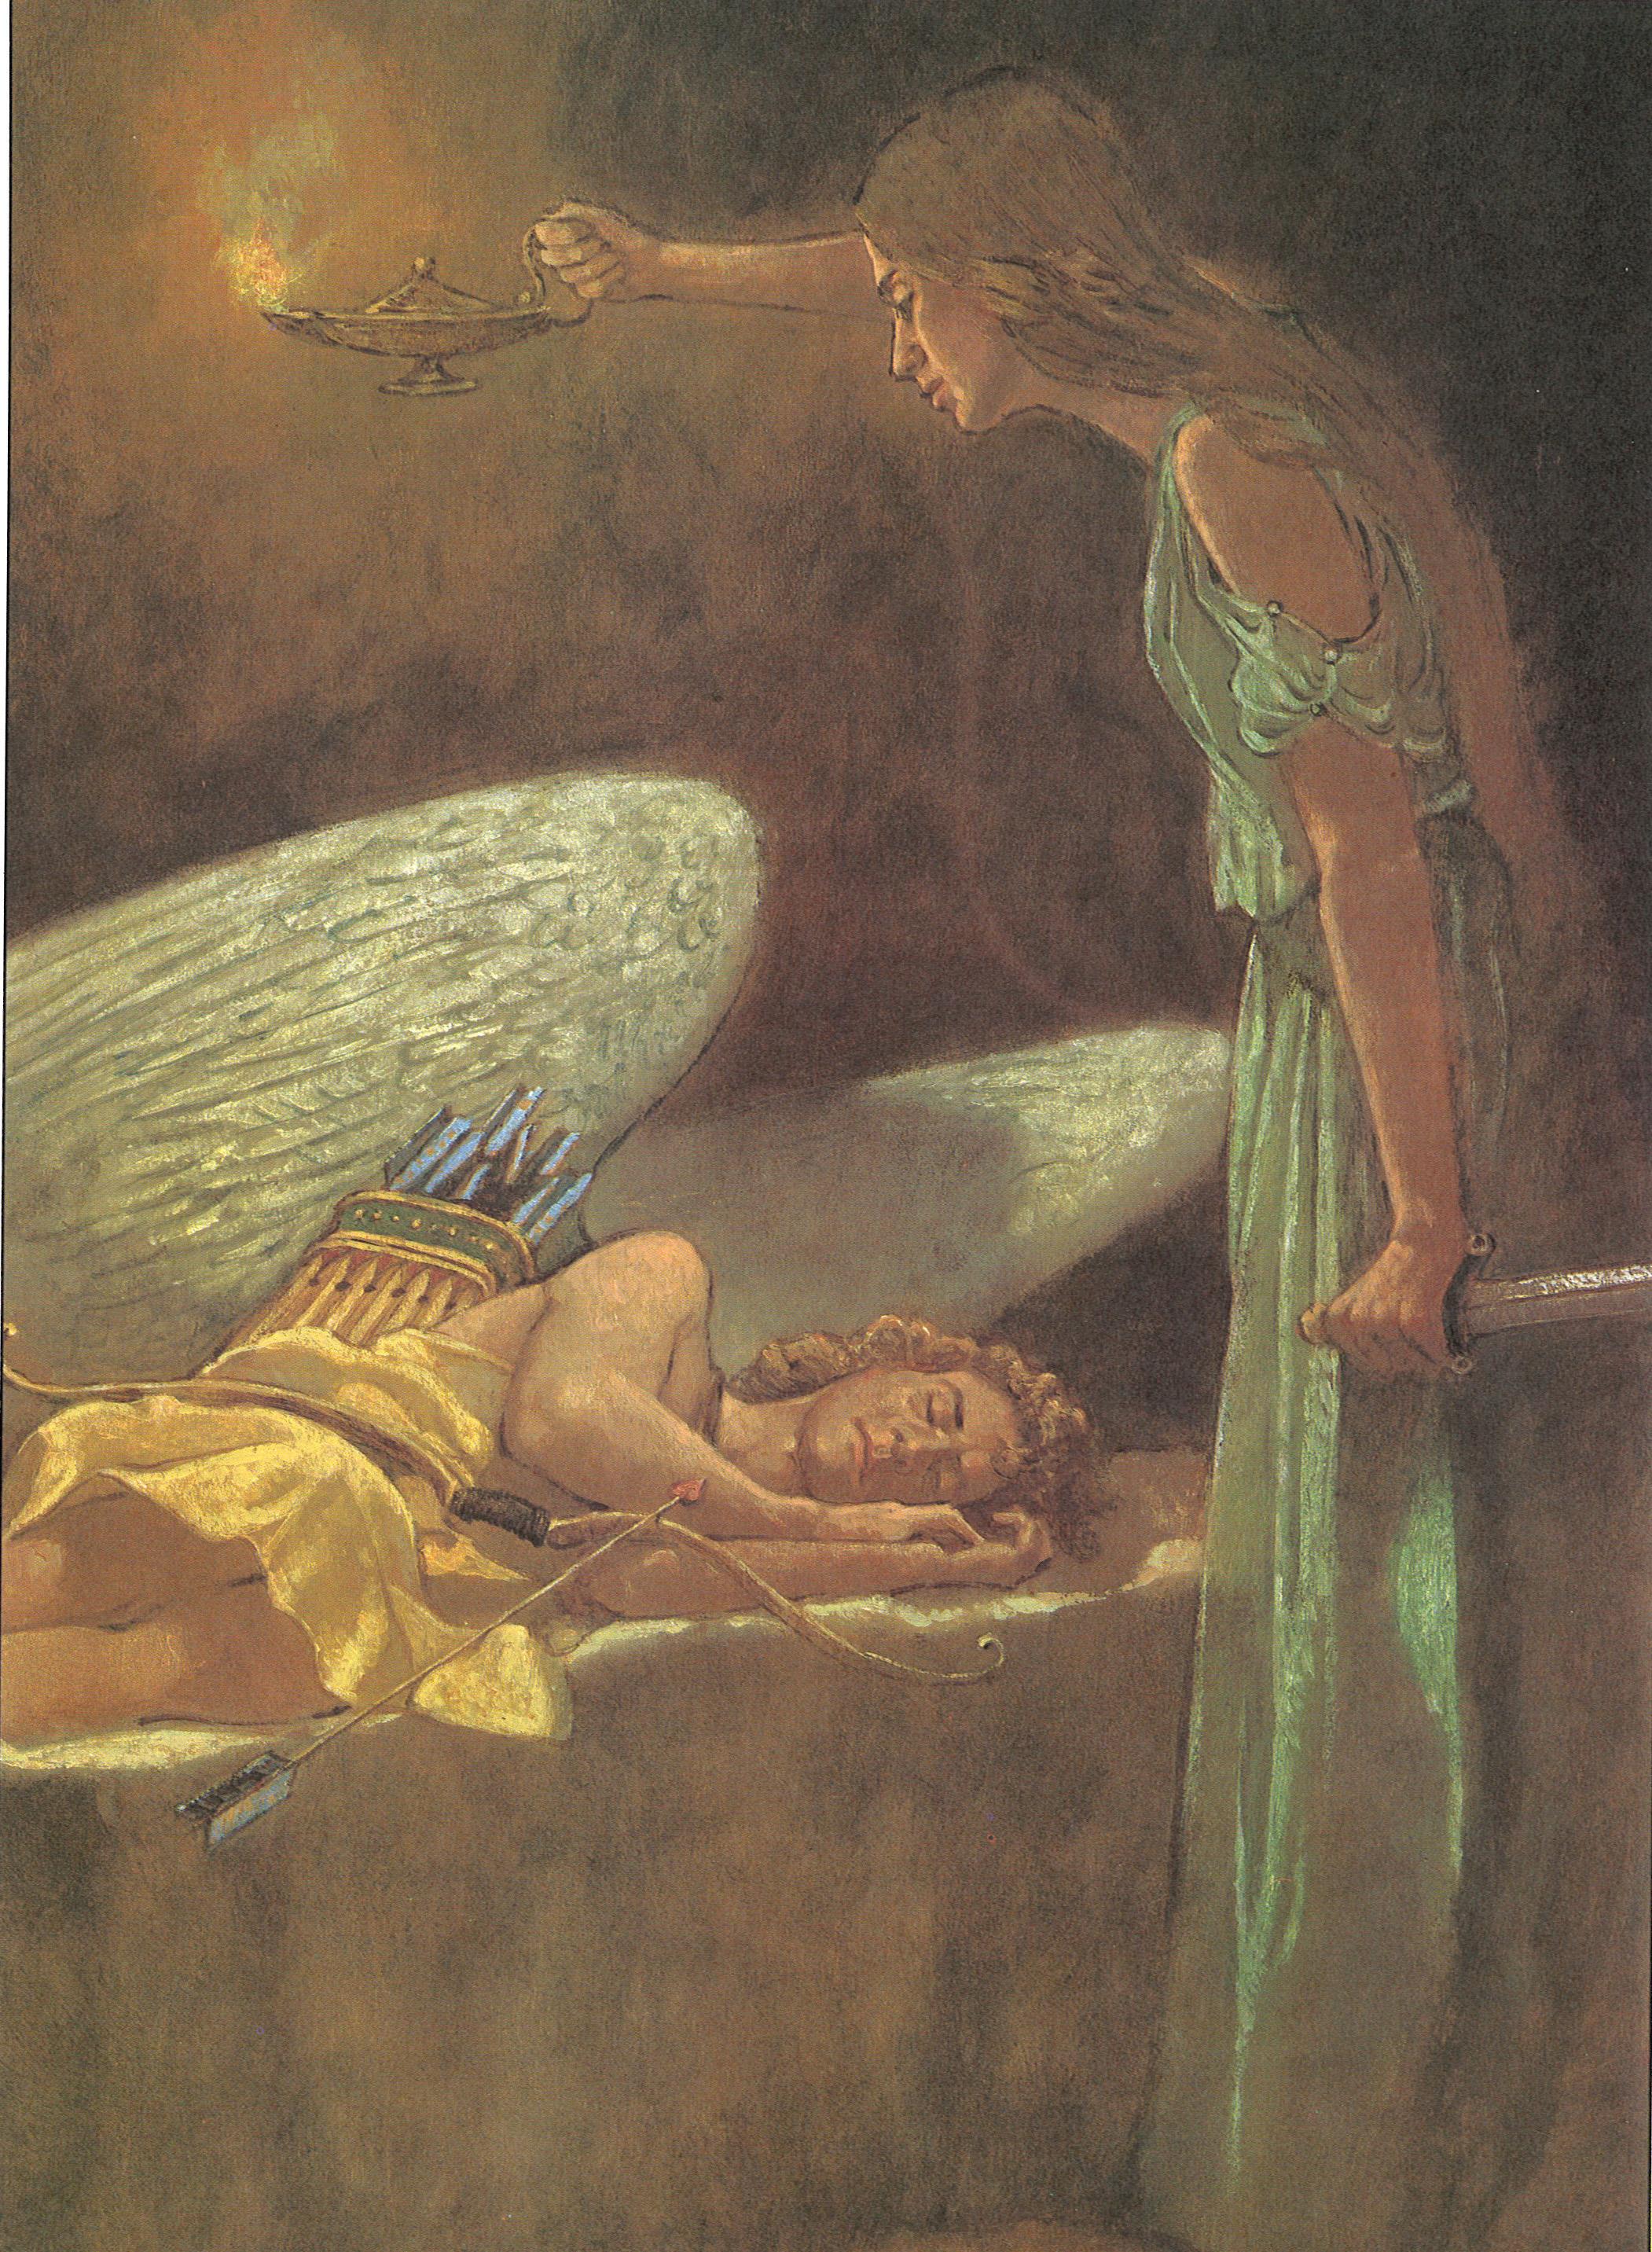 Eros story greek myths